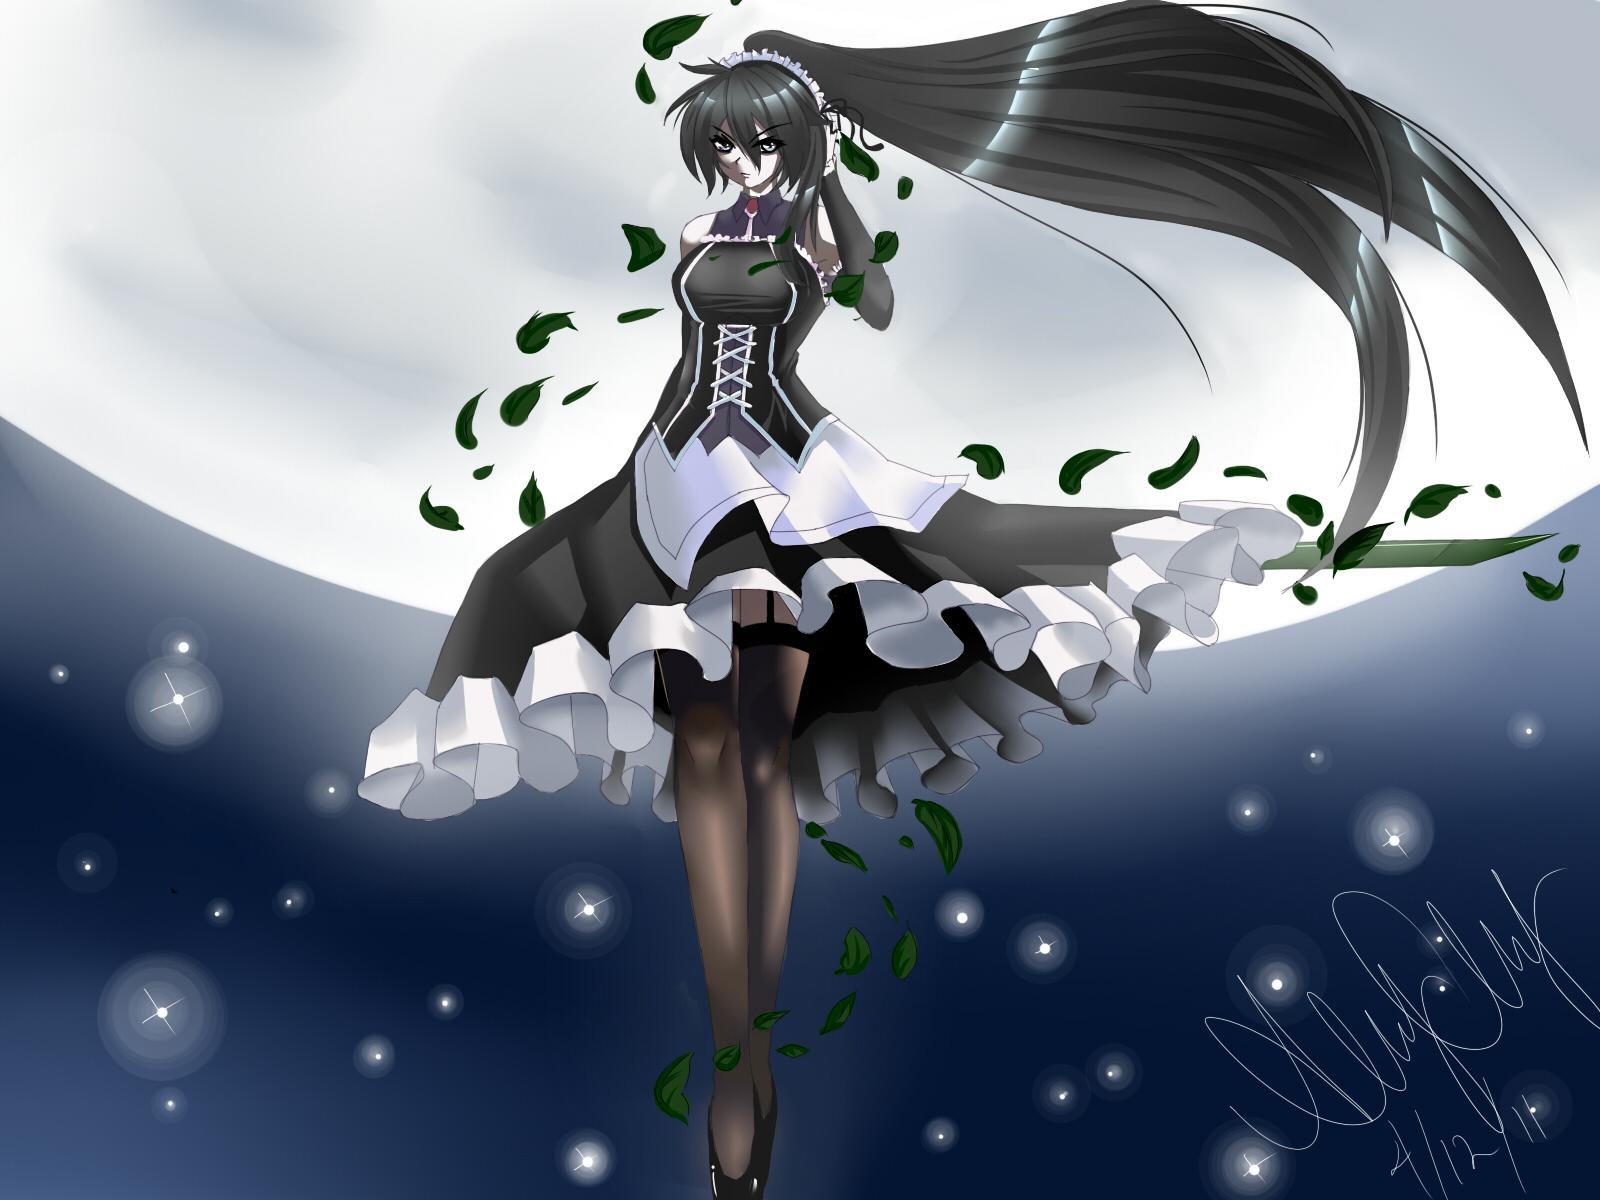 Seraphim by blackroseKJL on DeviantArt